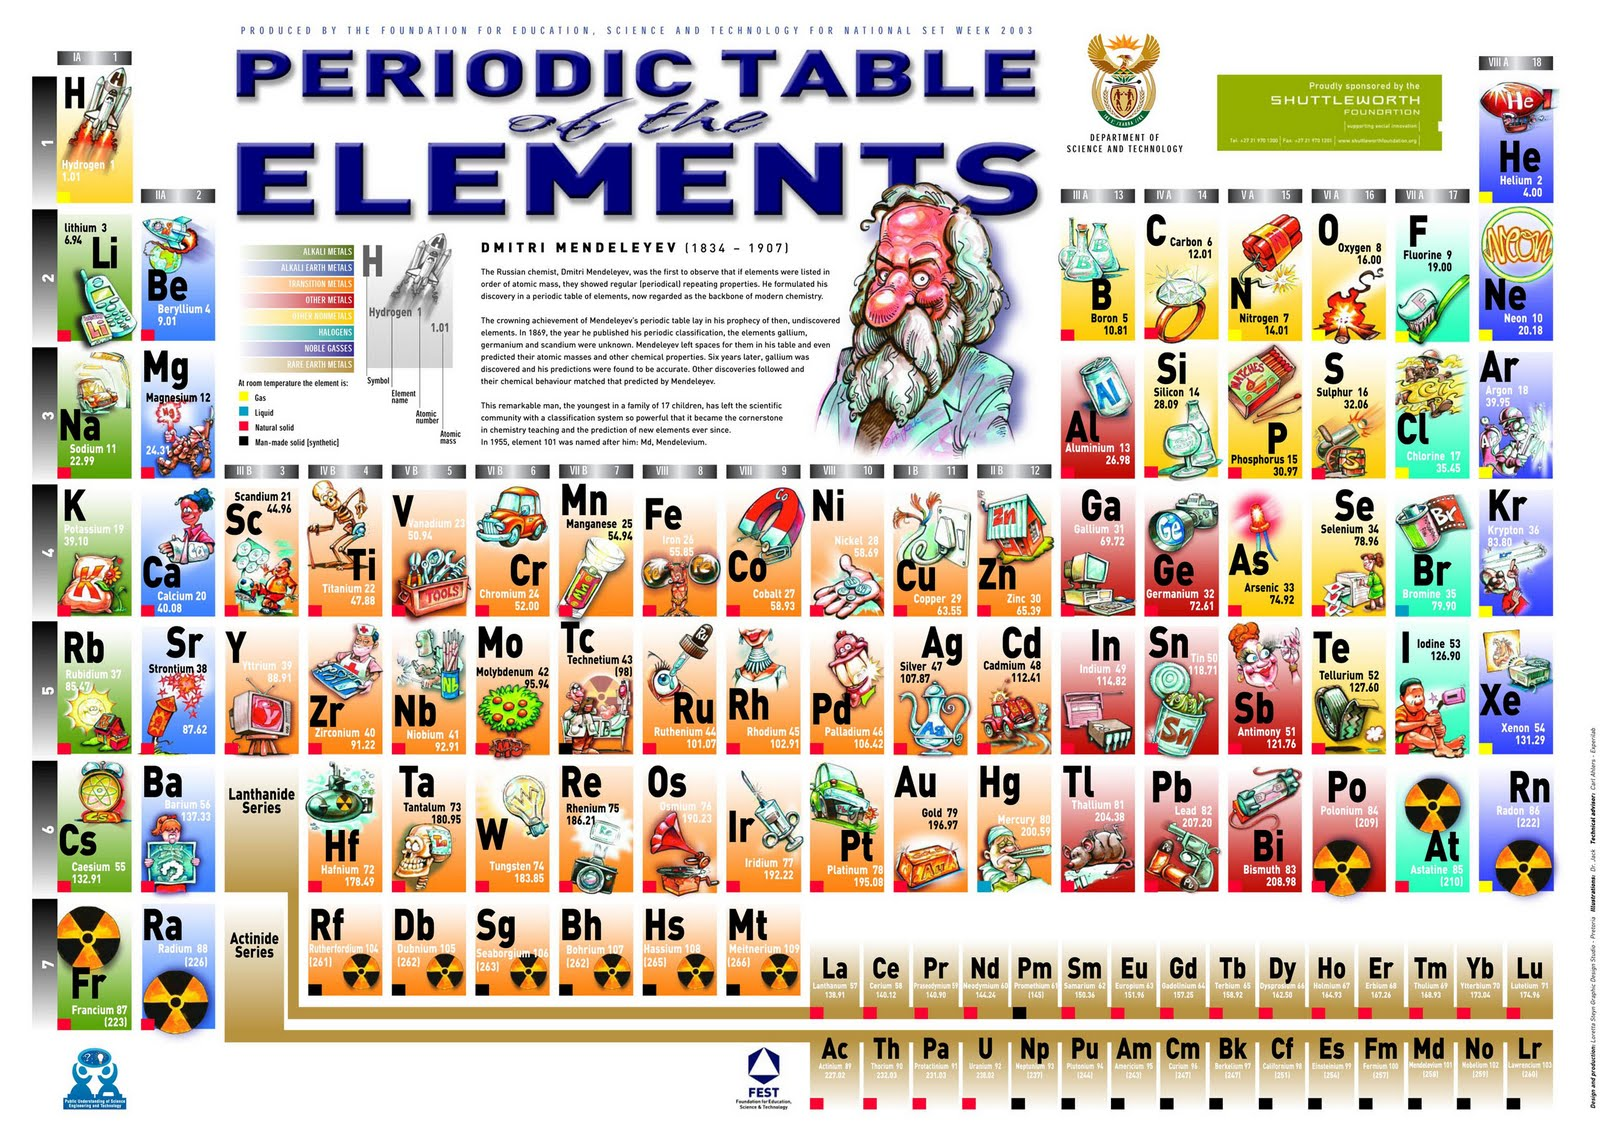 Integral quadrat mantra untuk menguasai tabel periodik unsur unsur mantra untuk menguasai tabel periodik unsur unsur dengan cepat urtaz Gallery